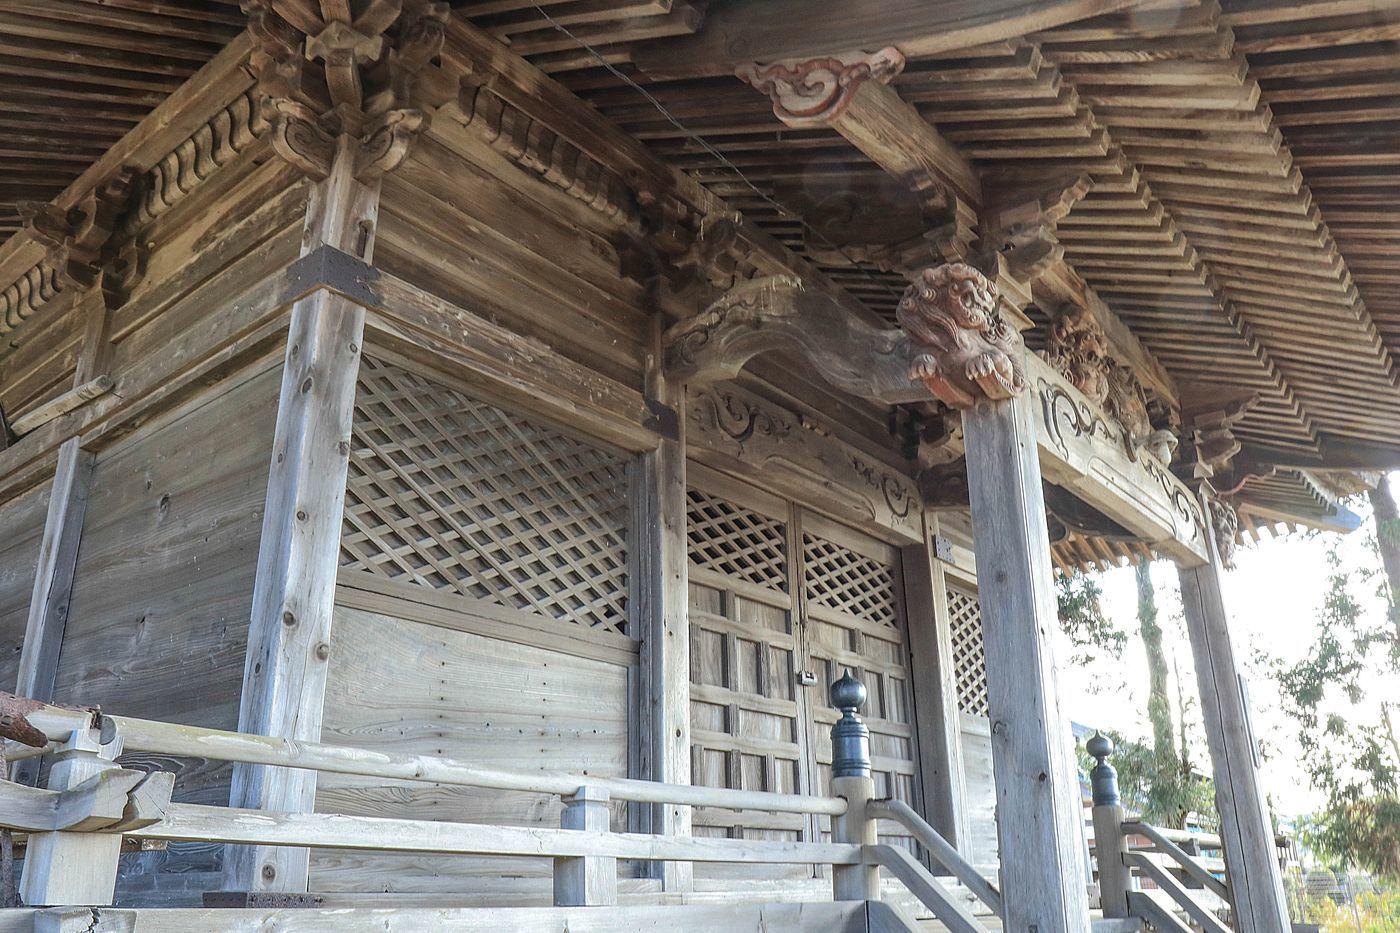 ●●●SPPLA2018・11・26阿賀野市前山諏訪神社_13 (1 - 1)